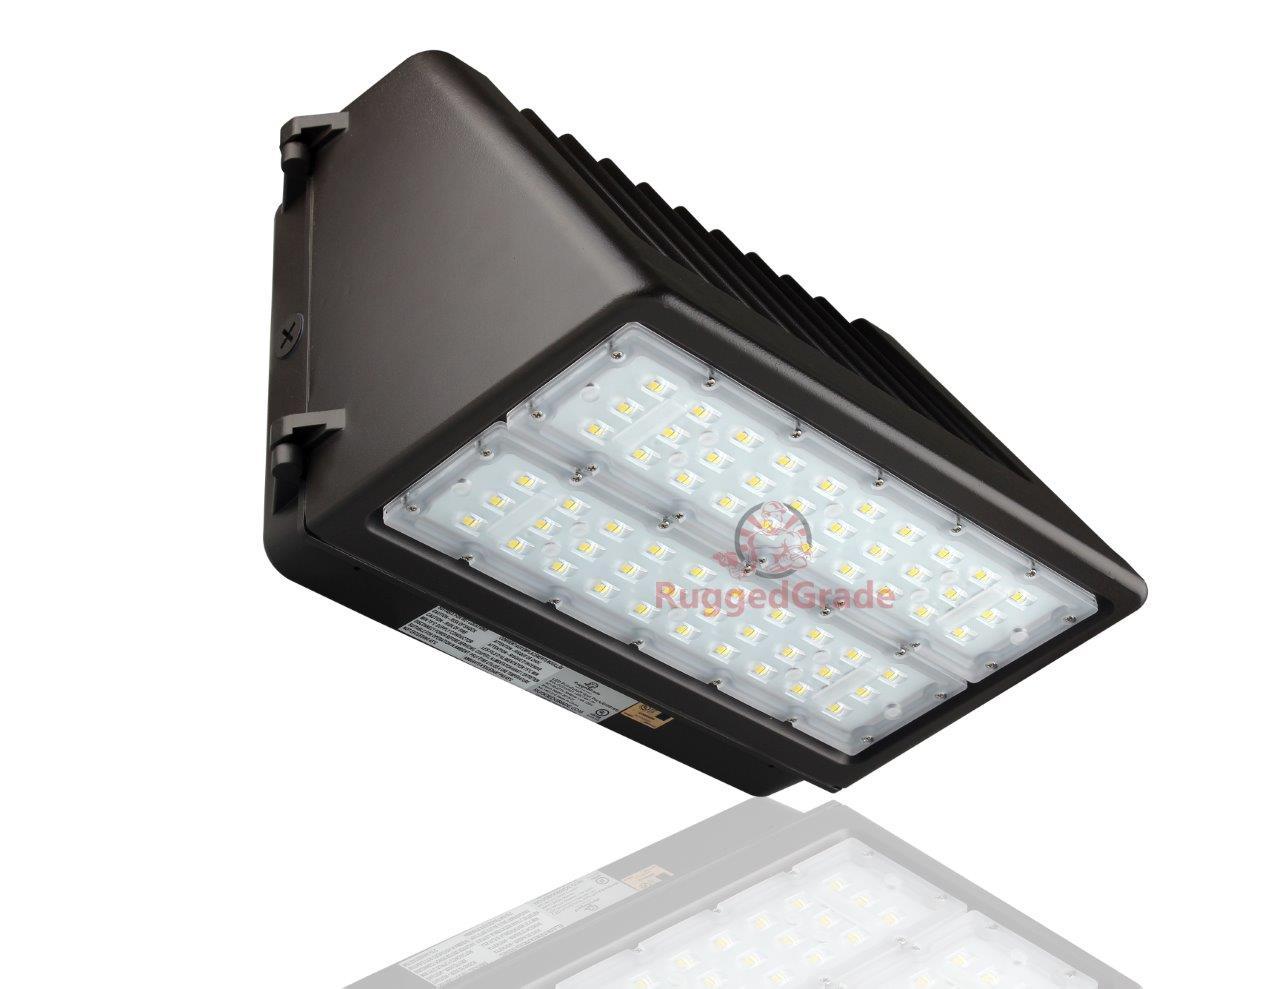 1000 Watt Metal Halide Led Replacement 120 watt led wall pack light with photocell - tucana series full cut off û  15,400 lumens- 5000k - dusk to dawn sensor dark sky compliant full cutoff